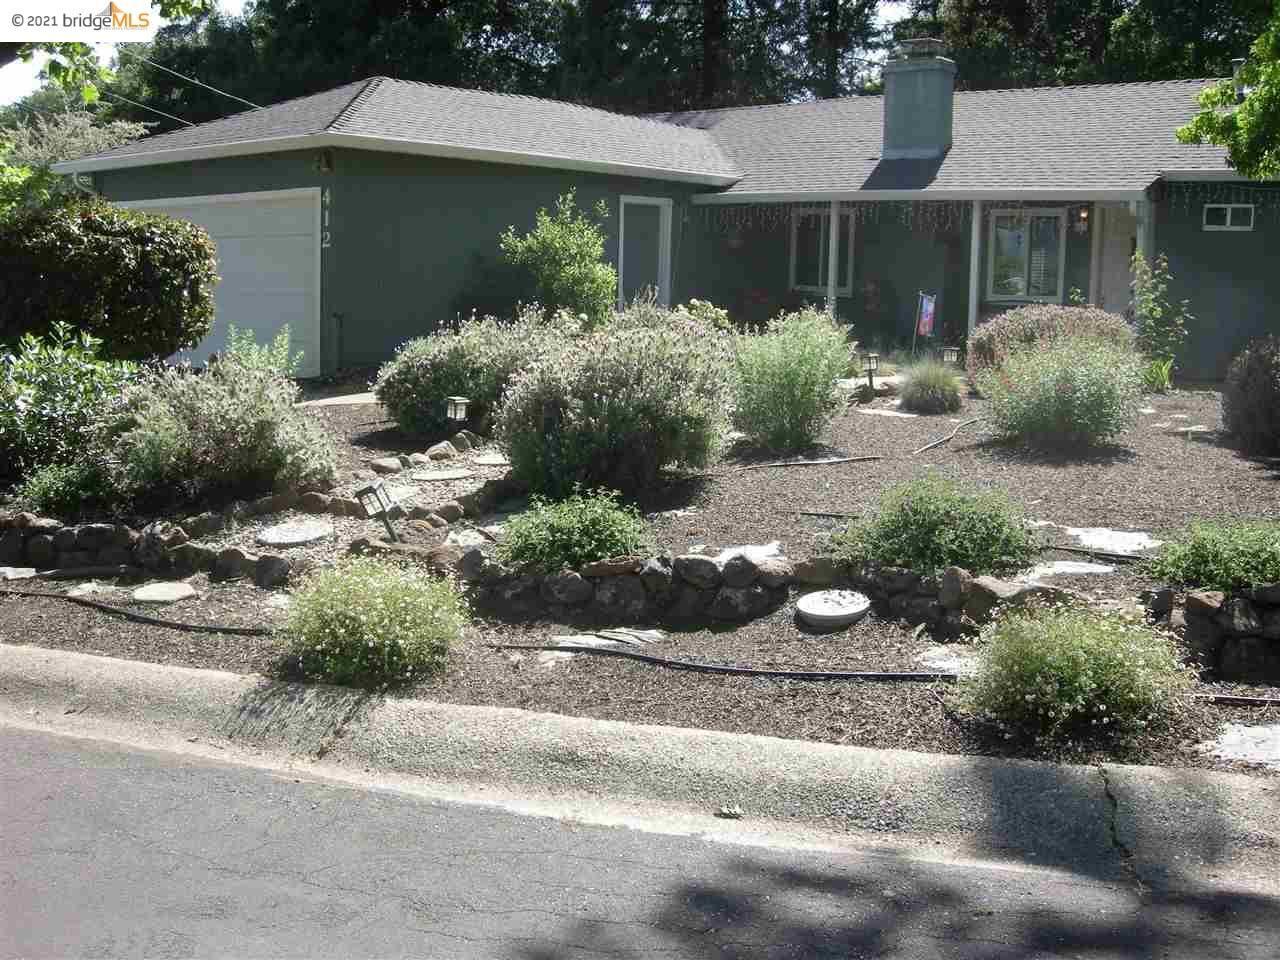 Photo of 412 LENOX COURT, PLEASANT HILL, CA 94523 (MLS # 40949343)